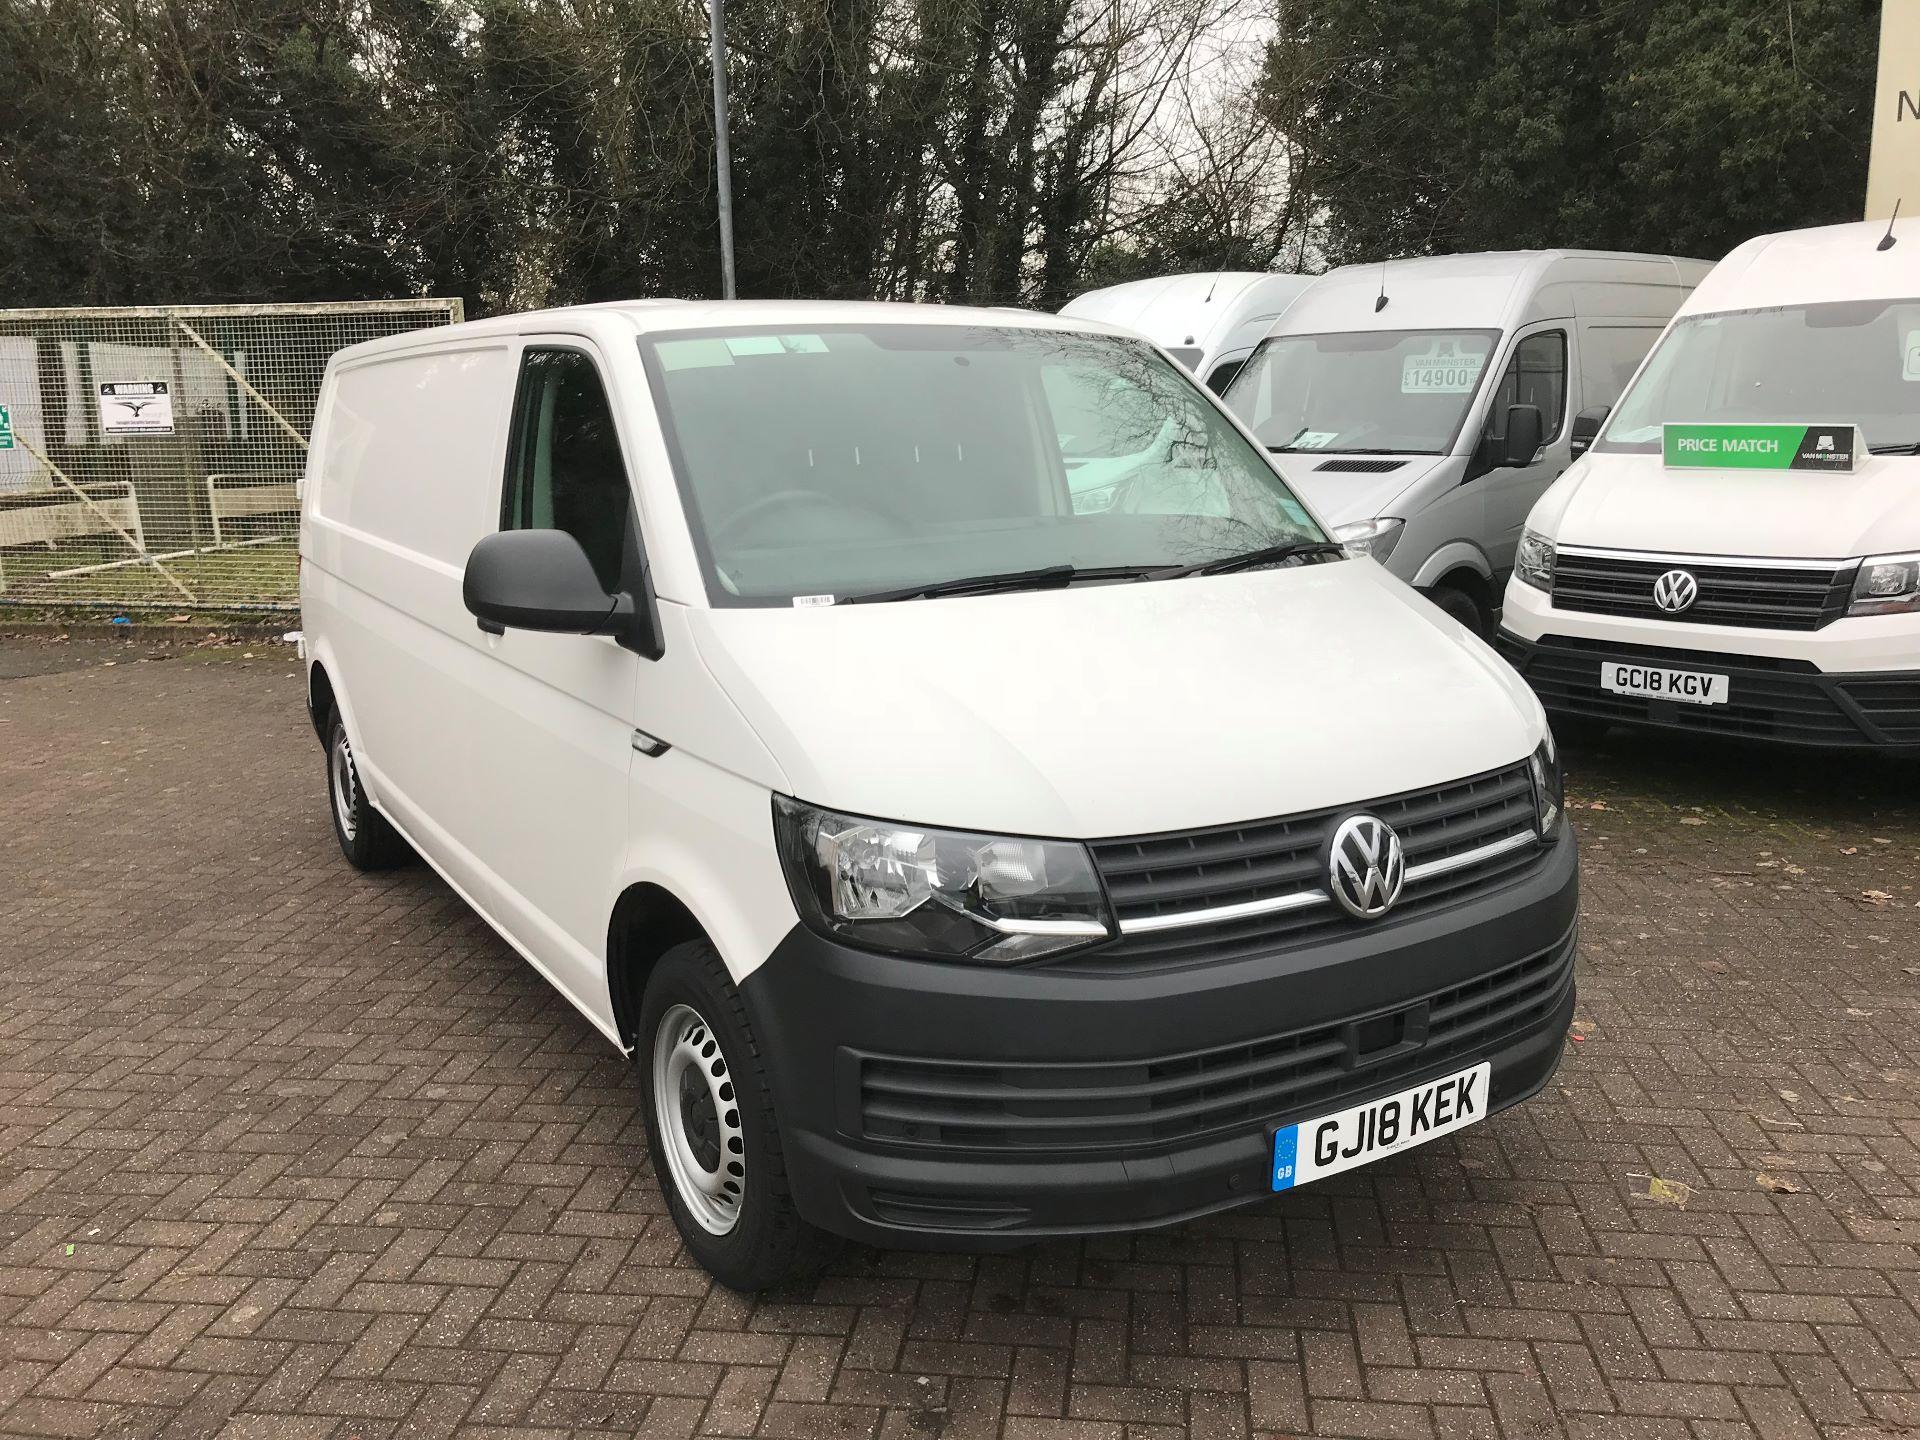 2018 Volkswagen Transporter T28 LWB DIESEL 2.0 TDI BMT 84 STARTLINE VAN EURO 6 (GJ18KEK)